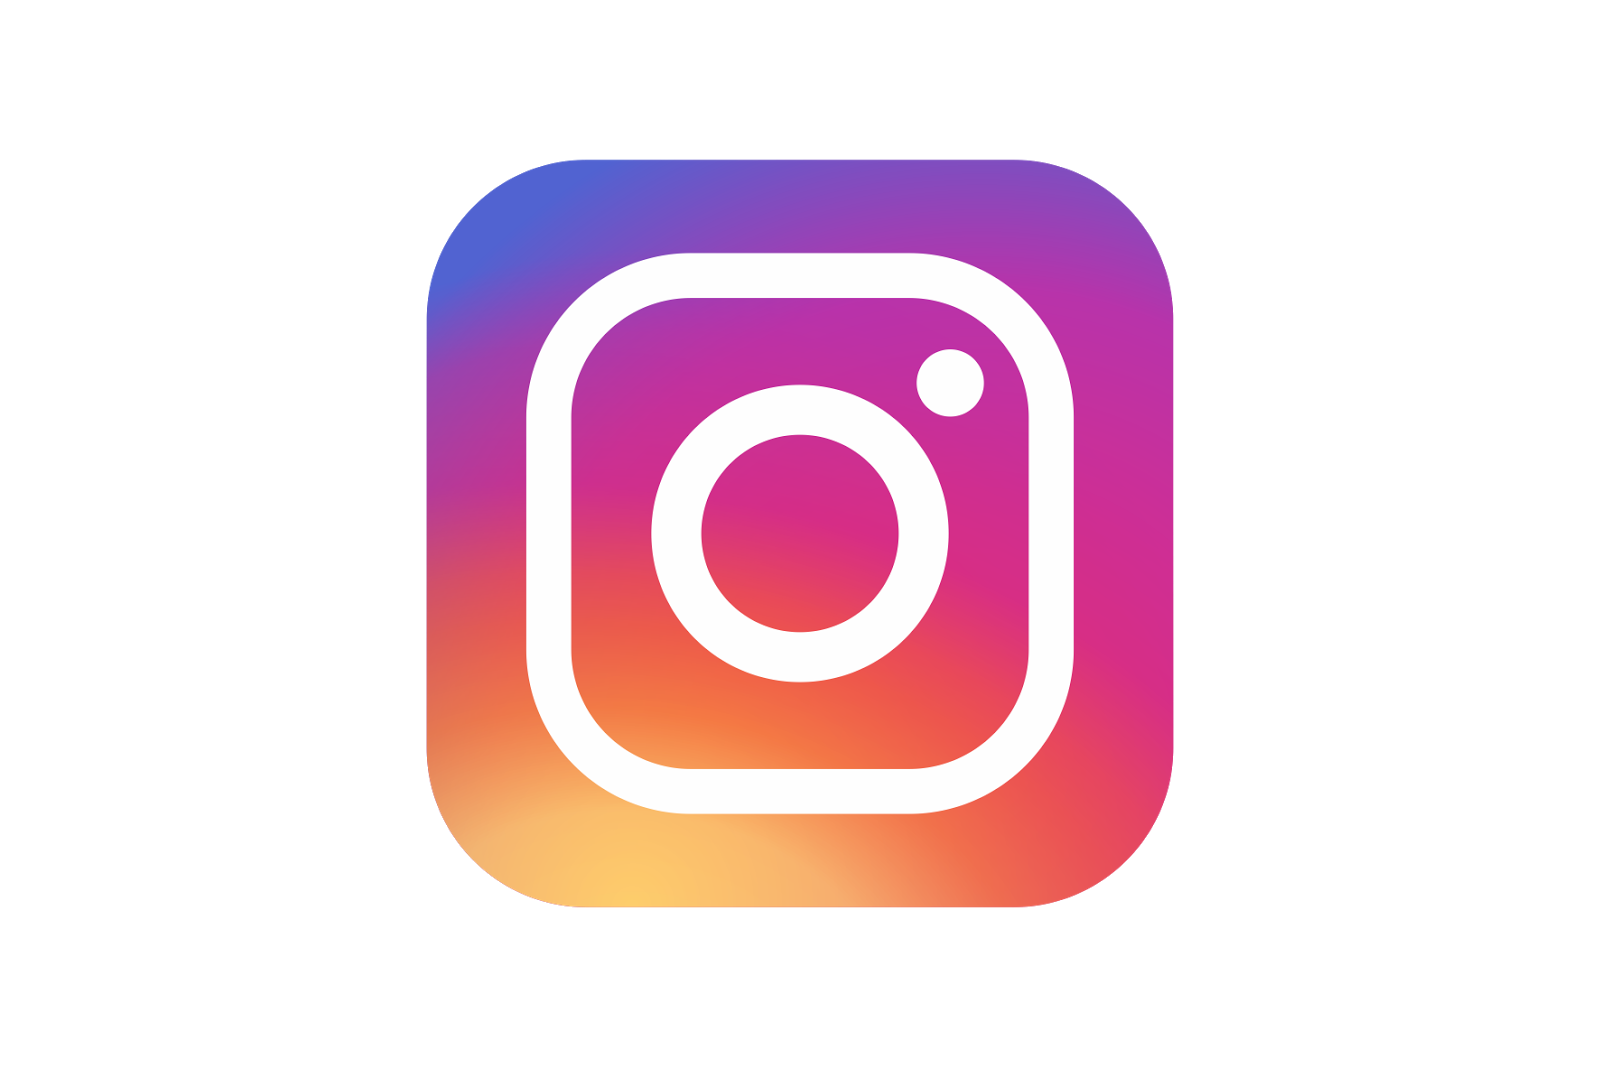 picture download New logo photos transparentpng. Instagram clipart.